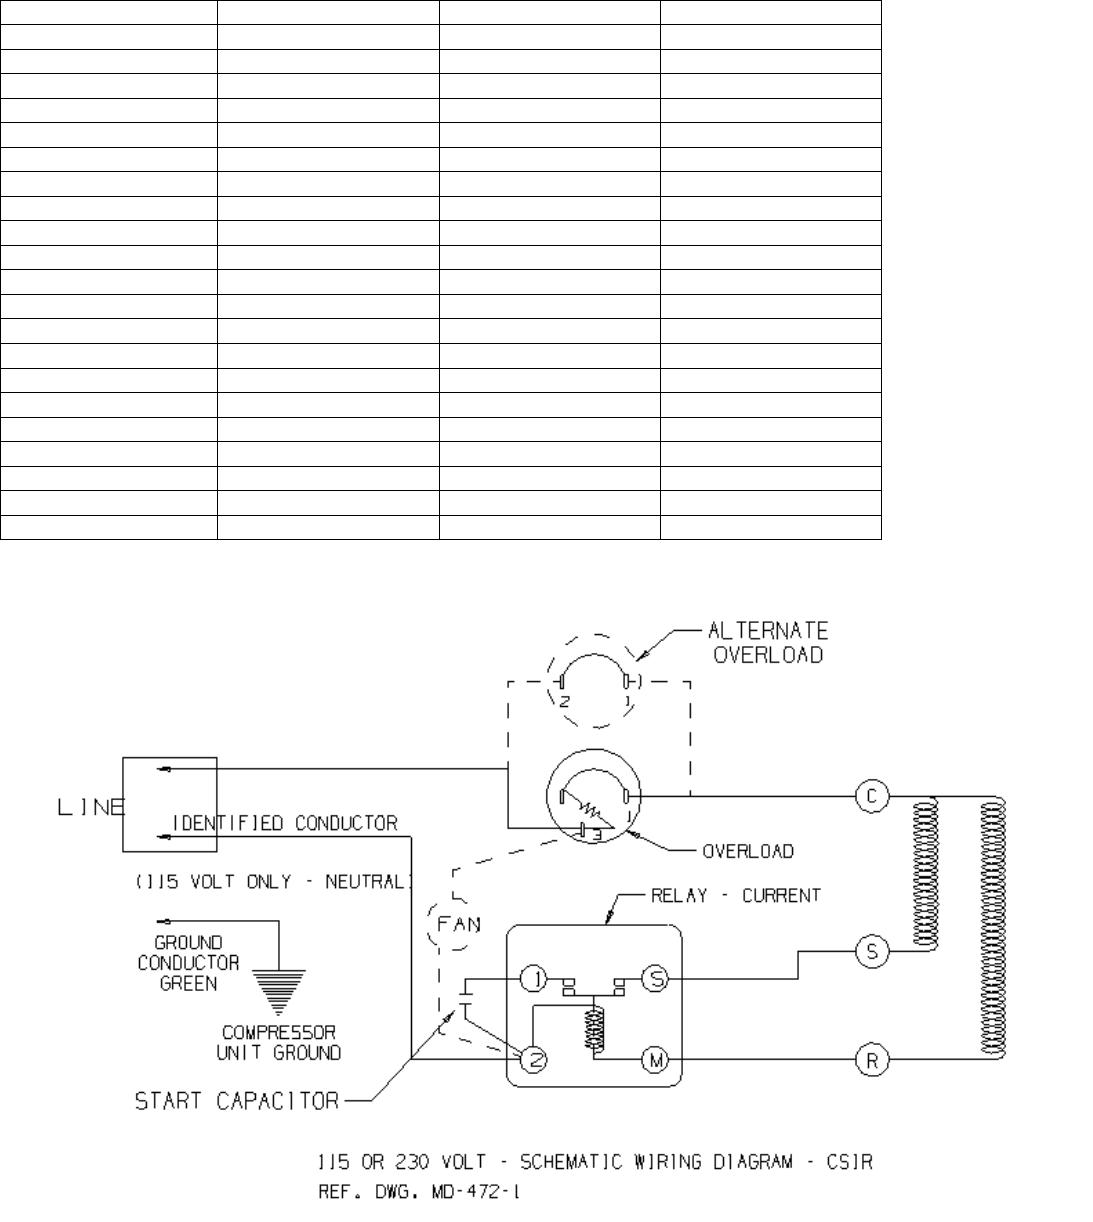 Tecumseh Aea4444Yxdpa Performance Data Sheet Aea4444yx_p_